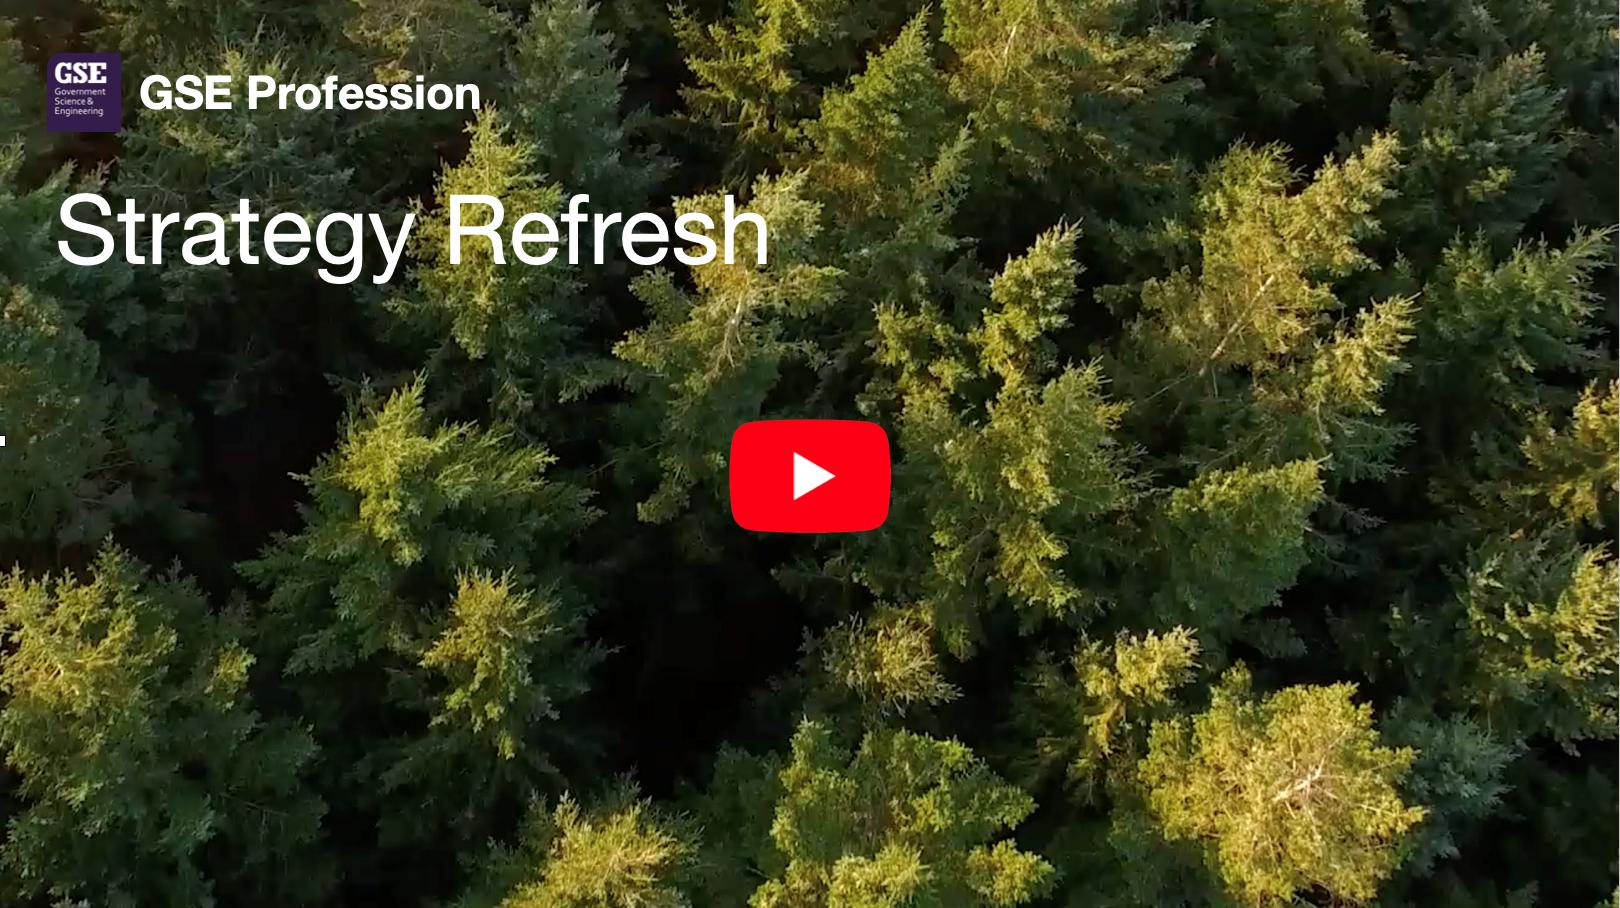 Strategy Refresh Launch Advert